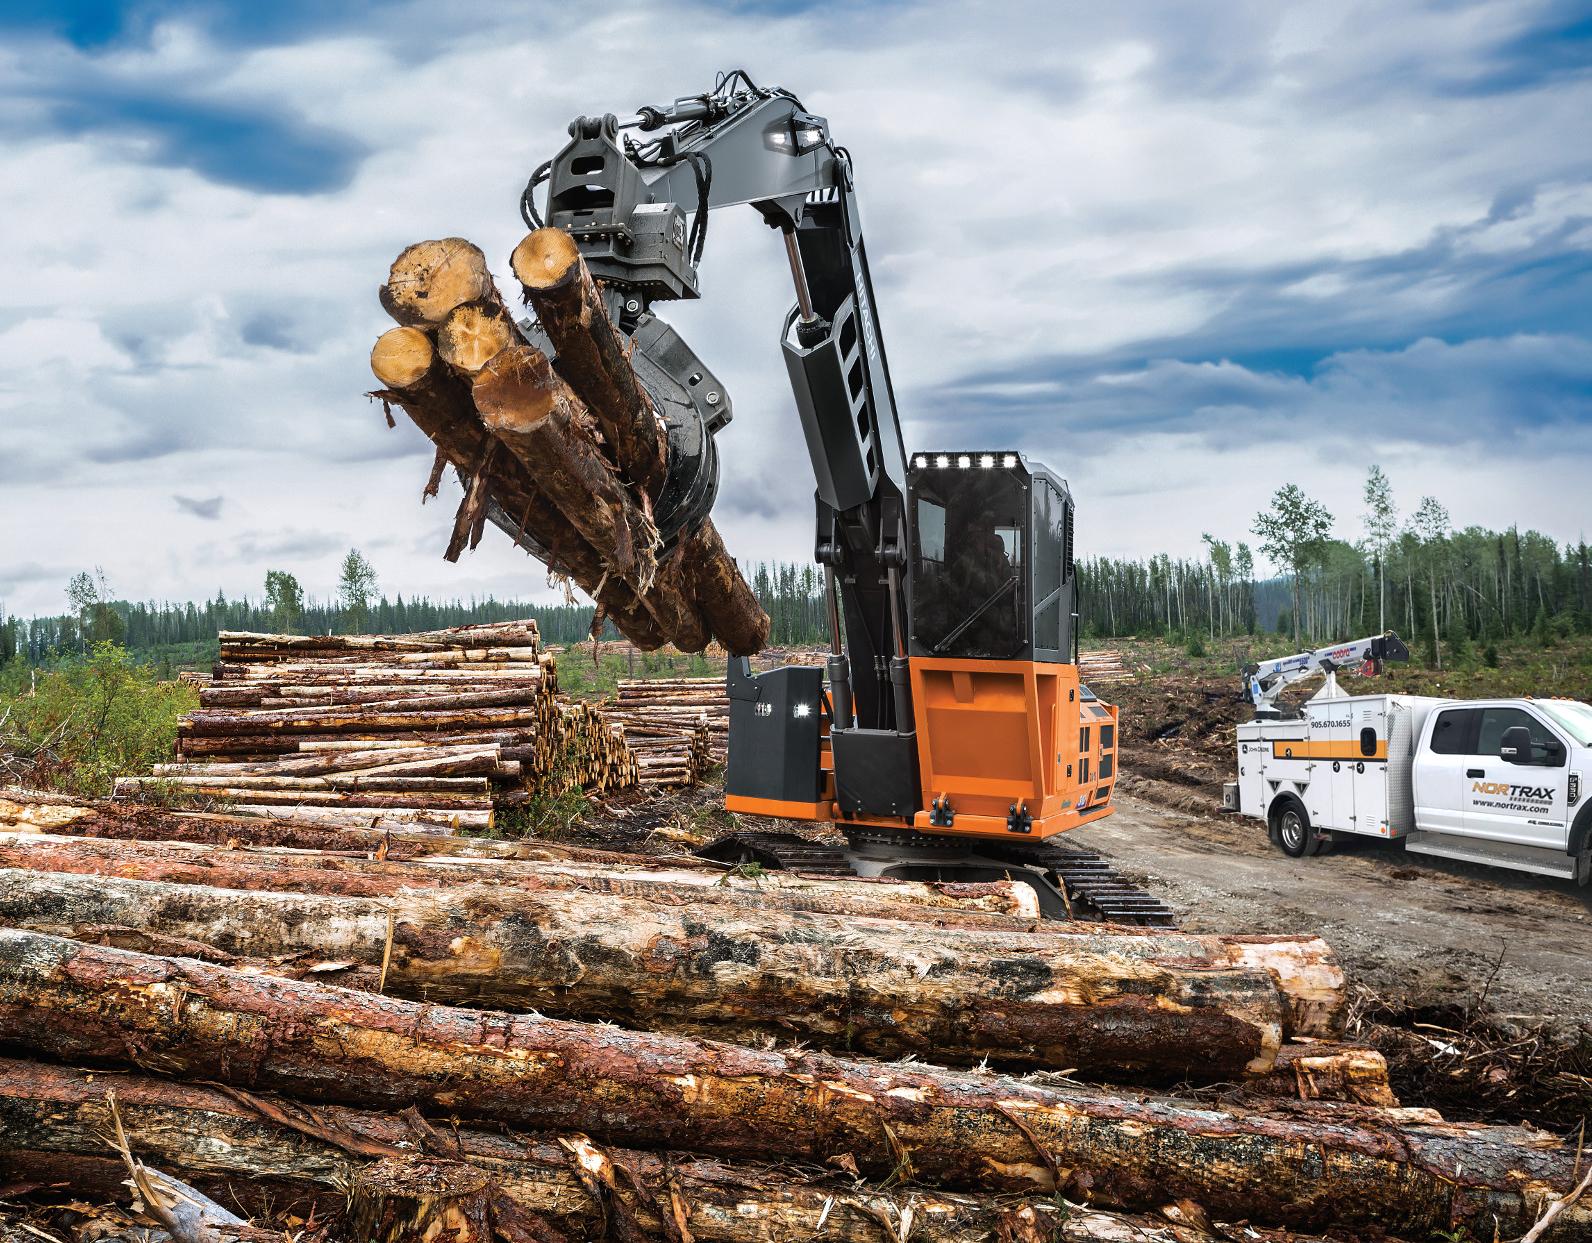 Hitachi forestry charlotte nc dump trucks picking up logs